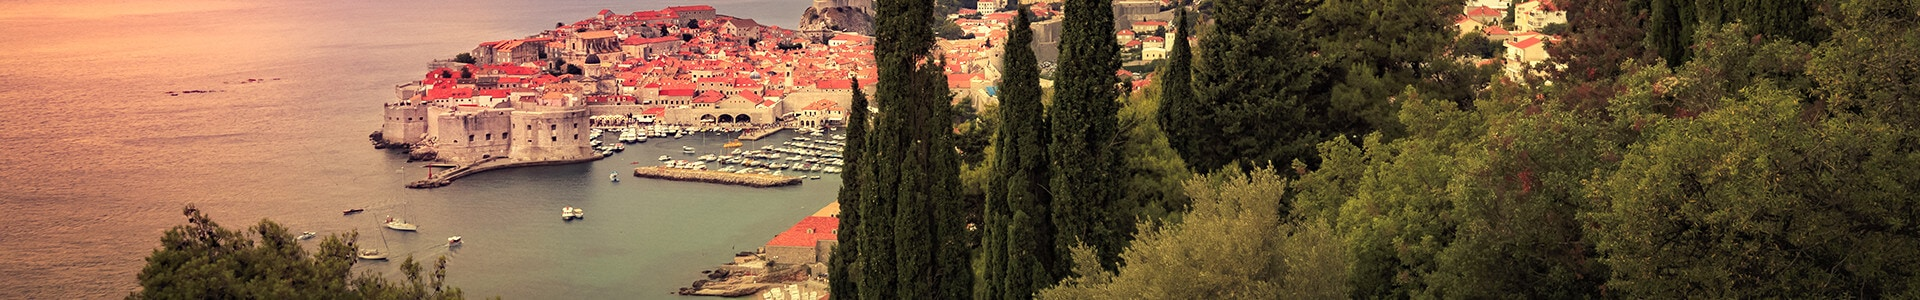 Voyage Dubrovnik - TUI